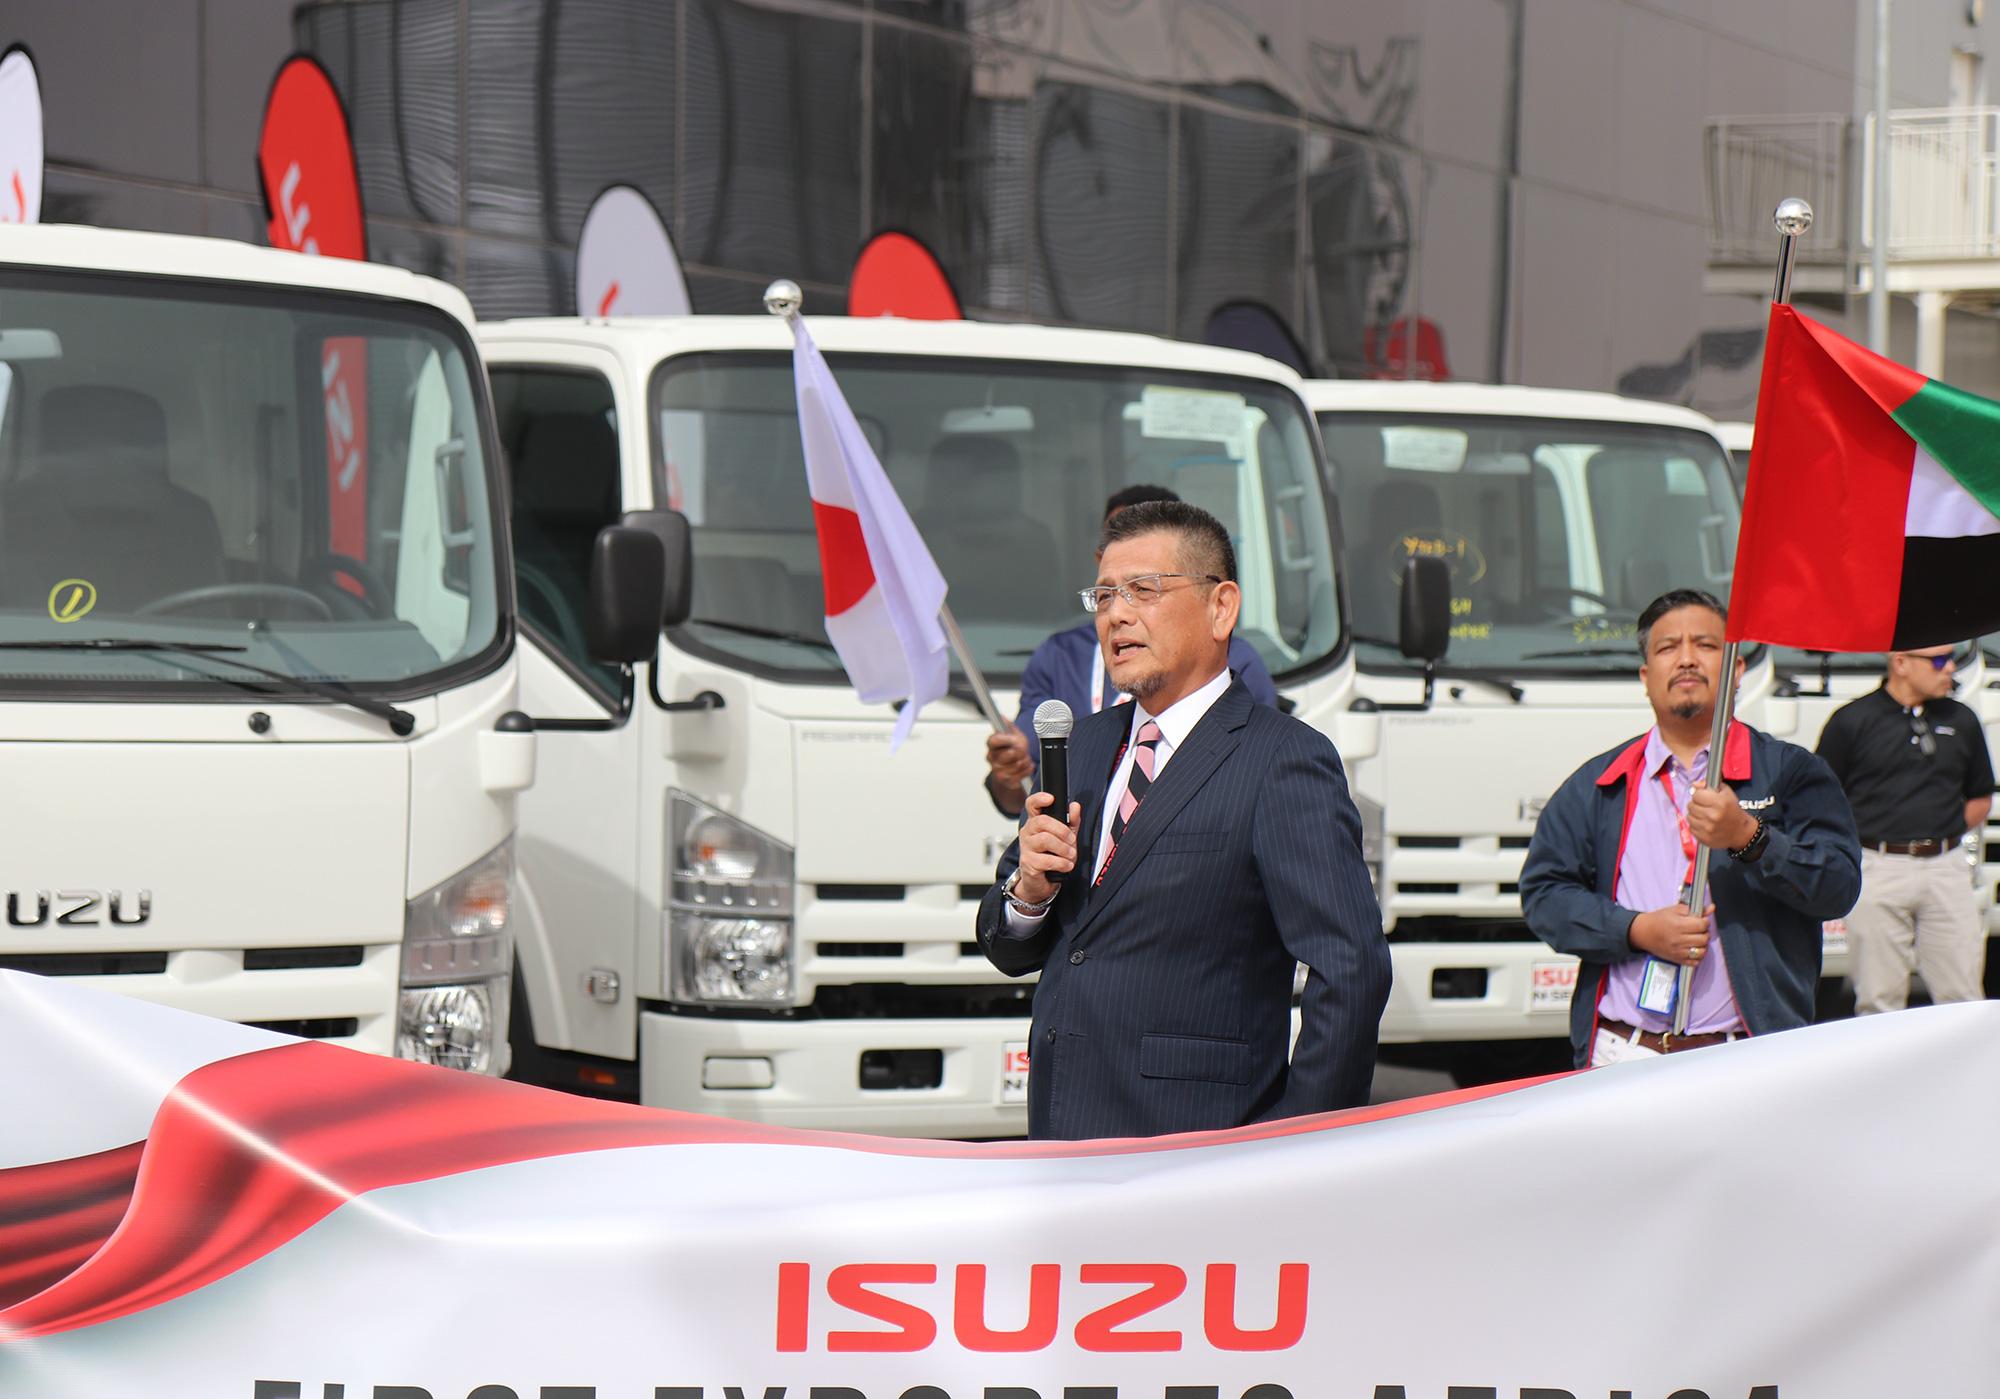 Isuzu First Export to Africa - Opening Ceremony Speech